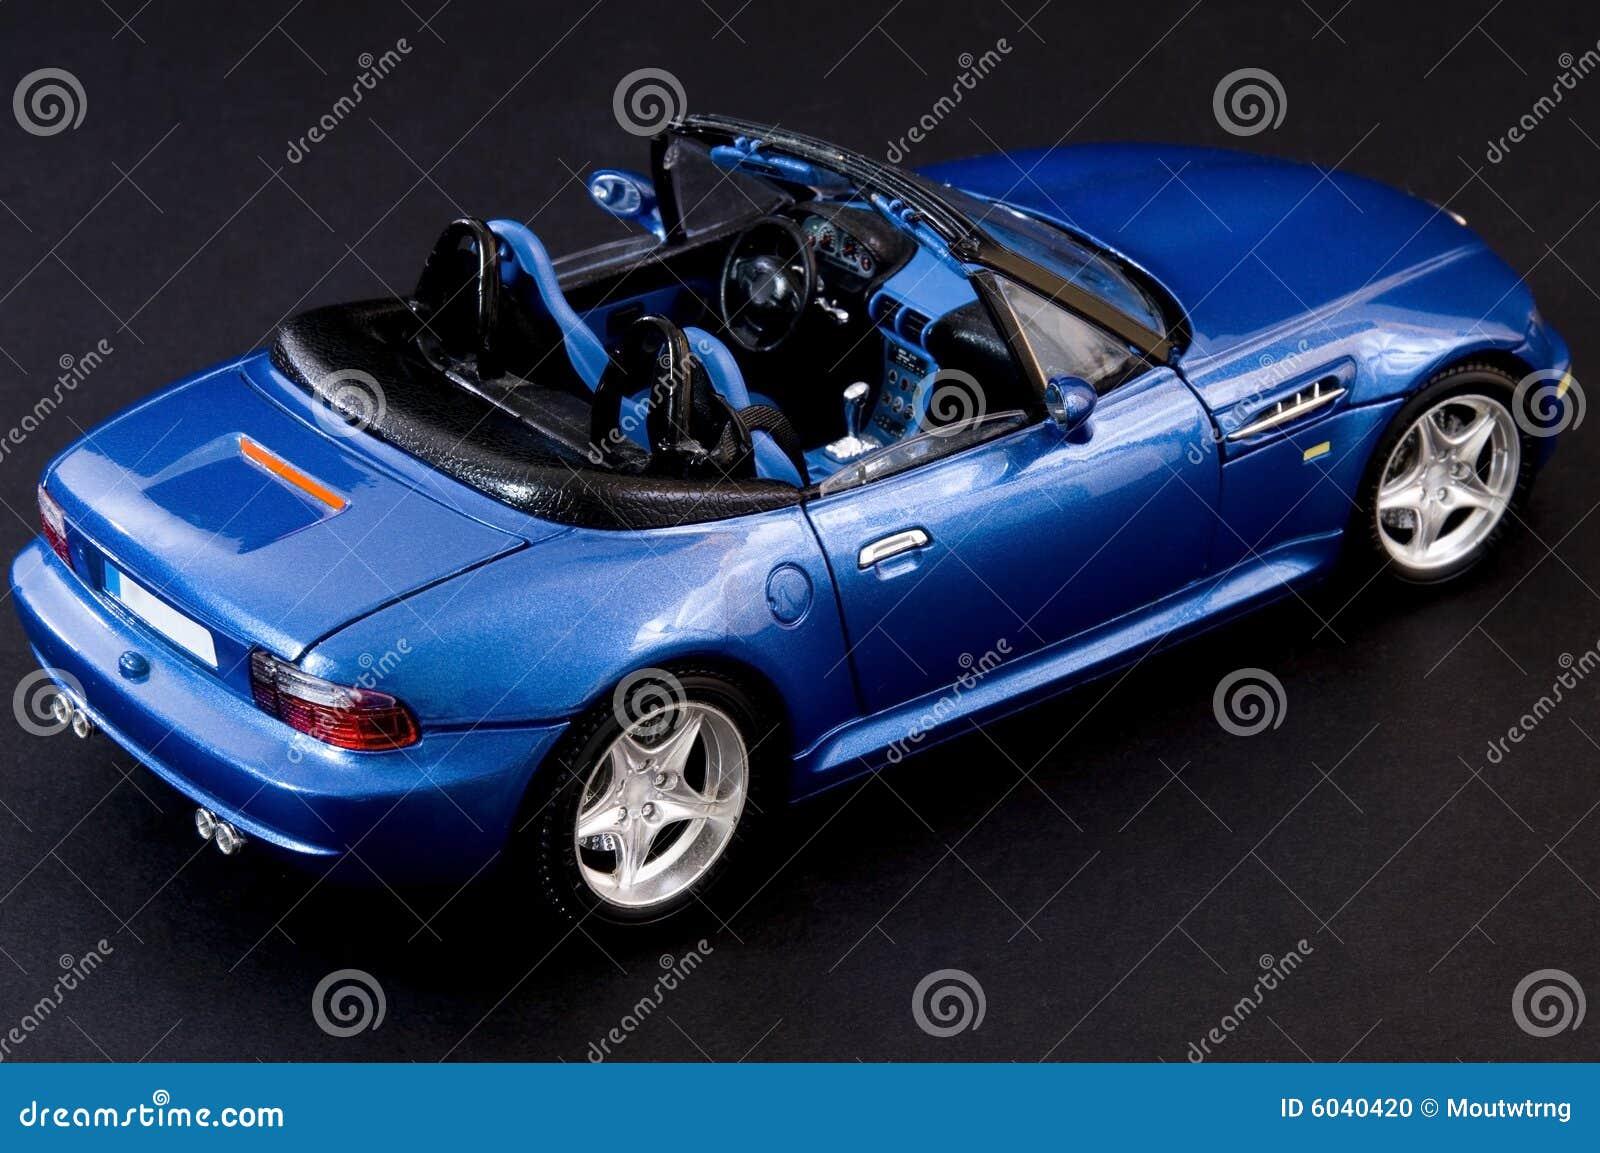 Stylish blue covertible roadster